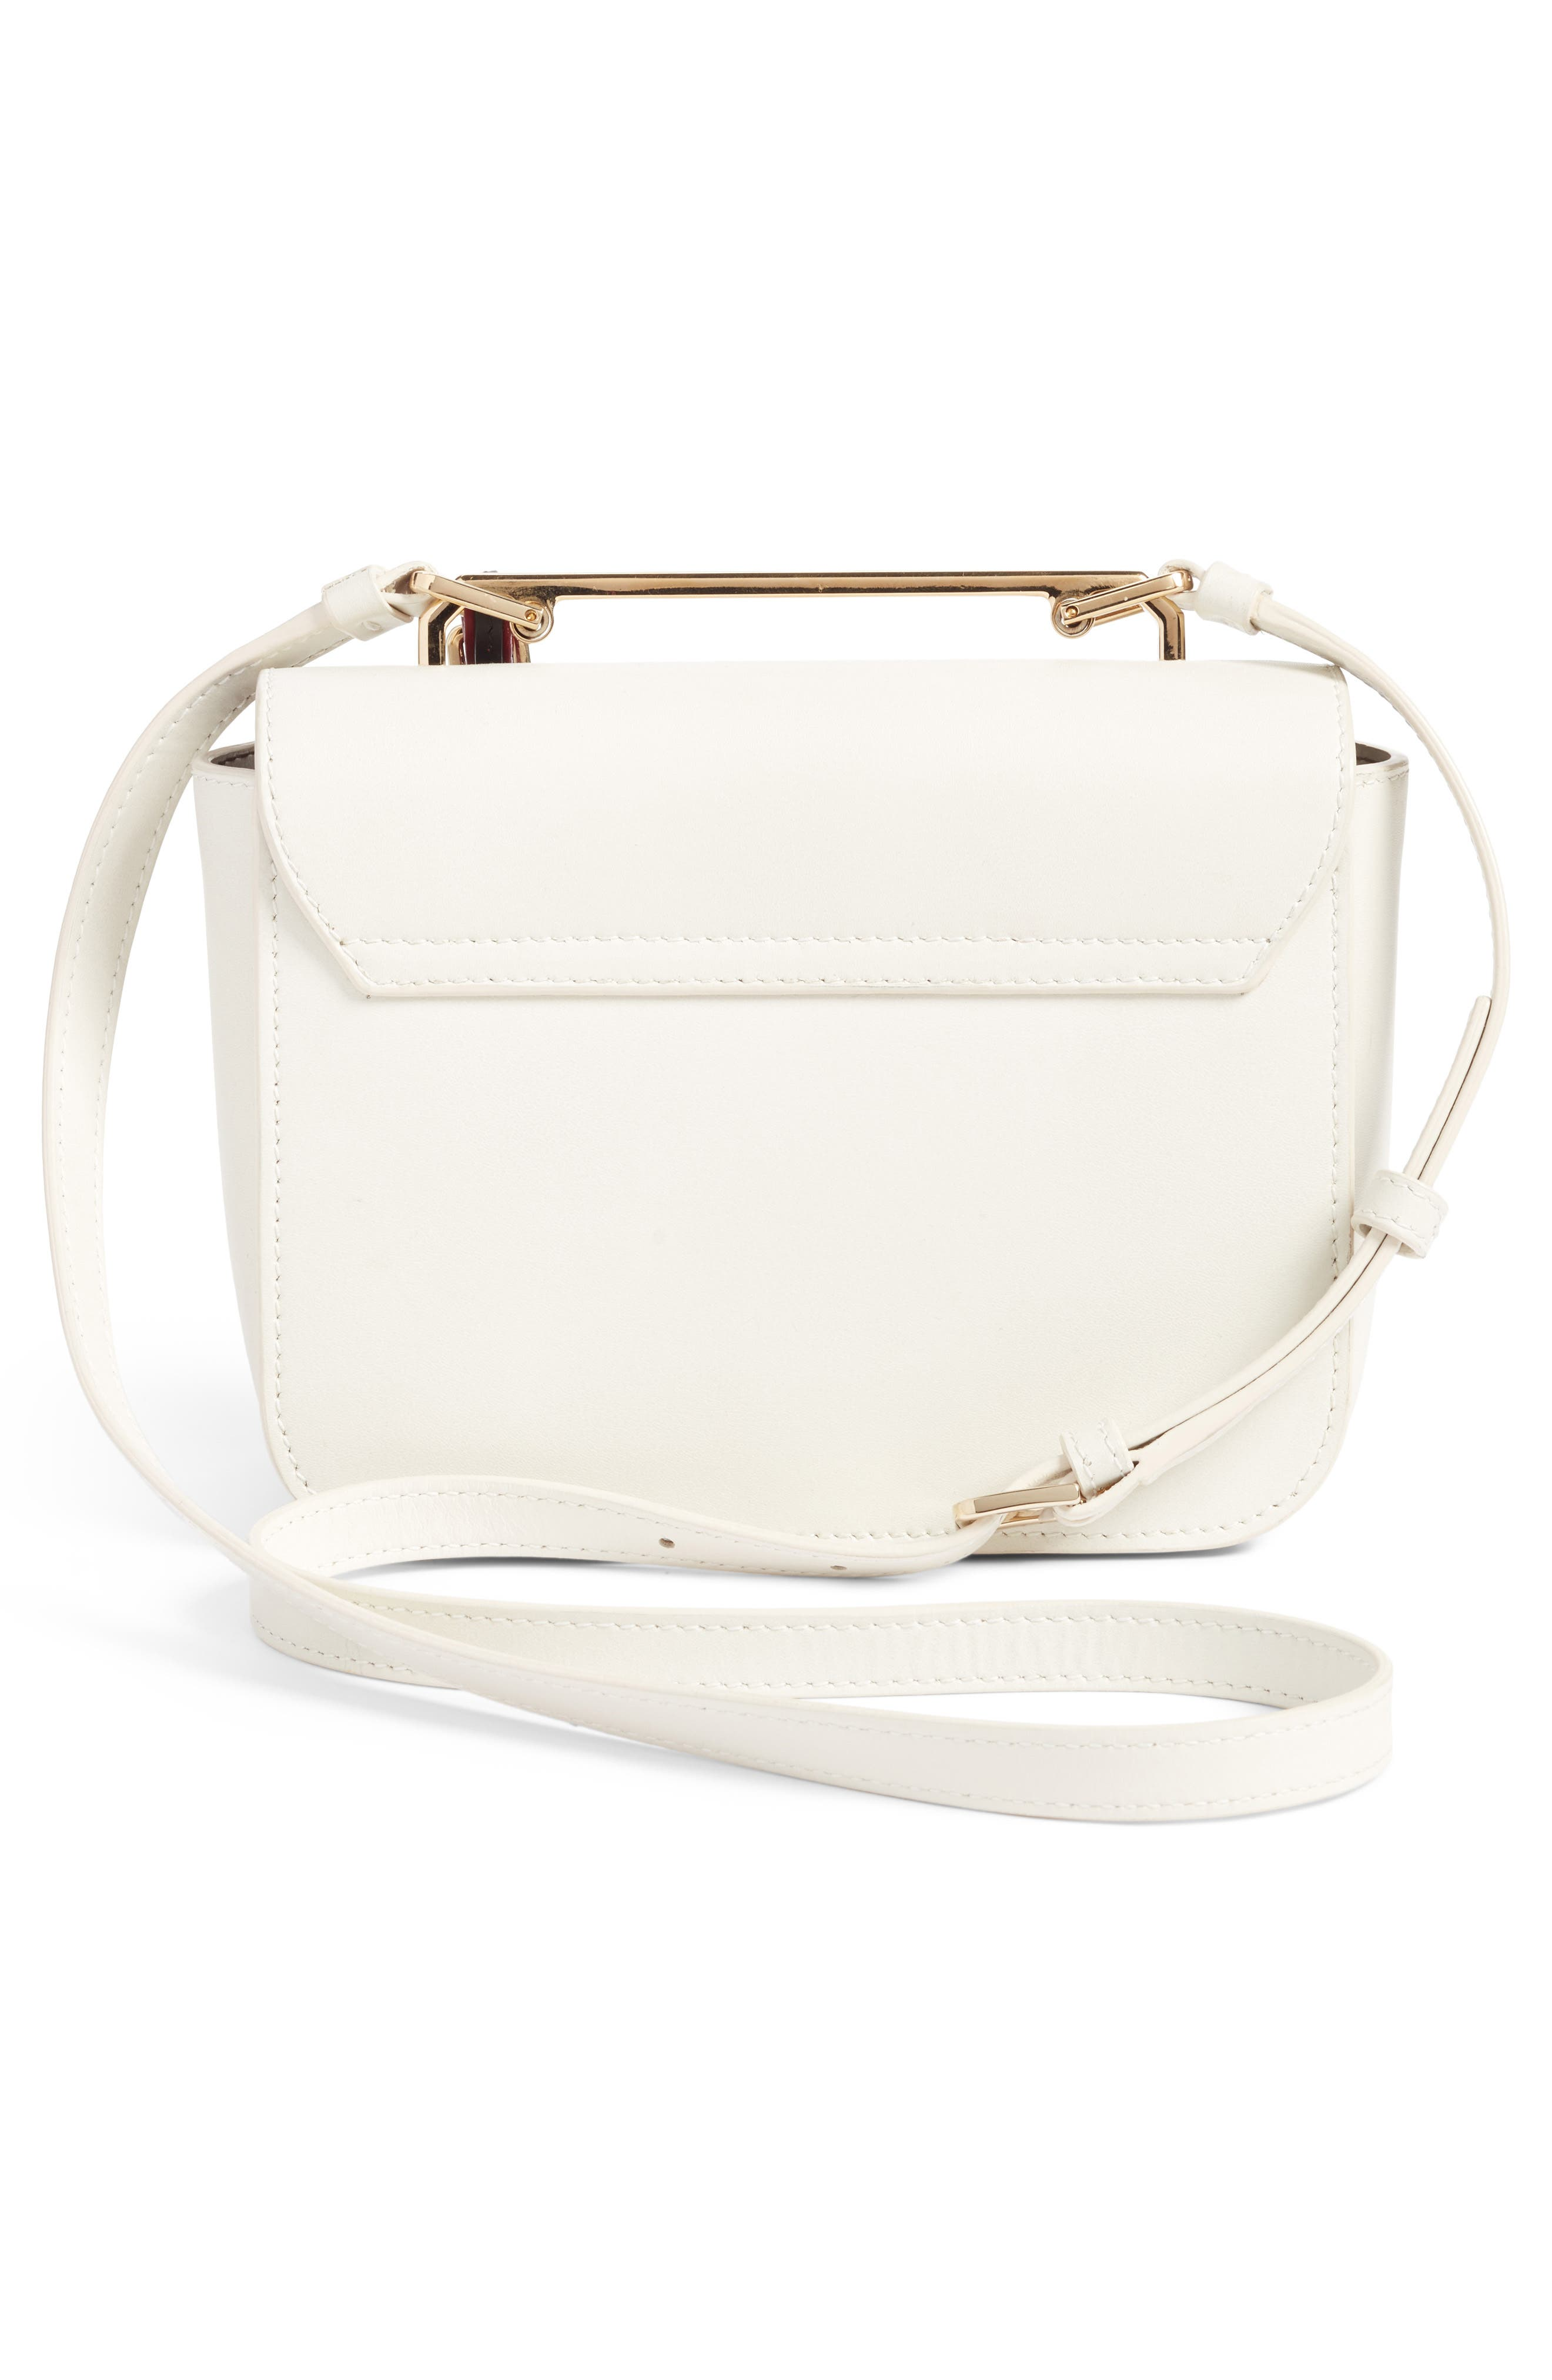 Elisir Mini Crossbody Bag,                             Alternate thumbnail 3, color,                             Petalo